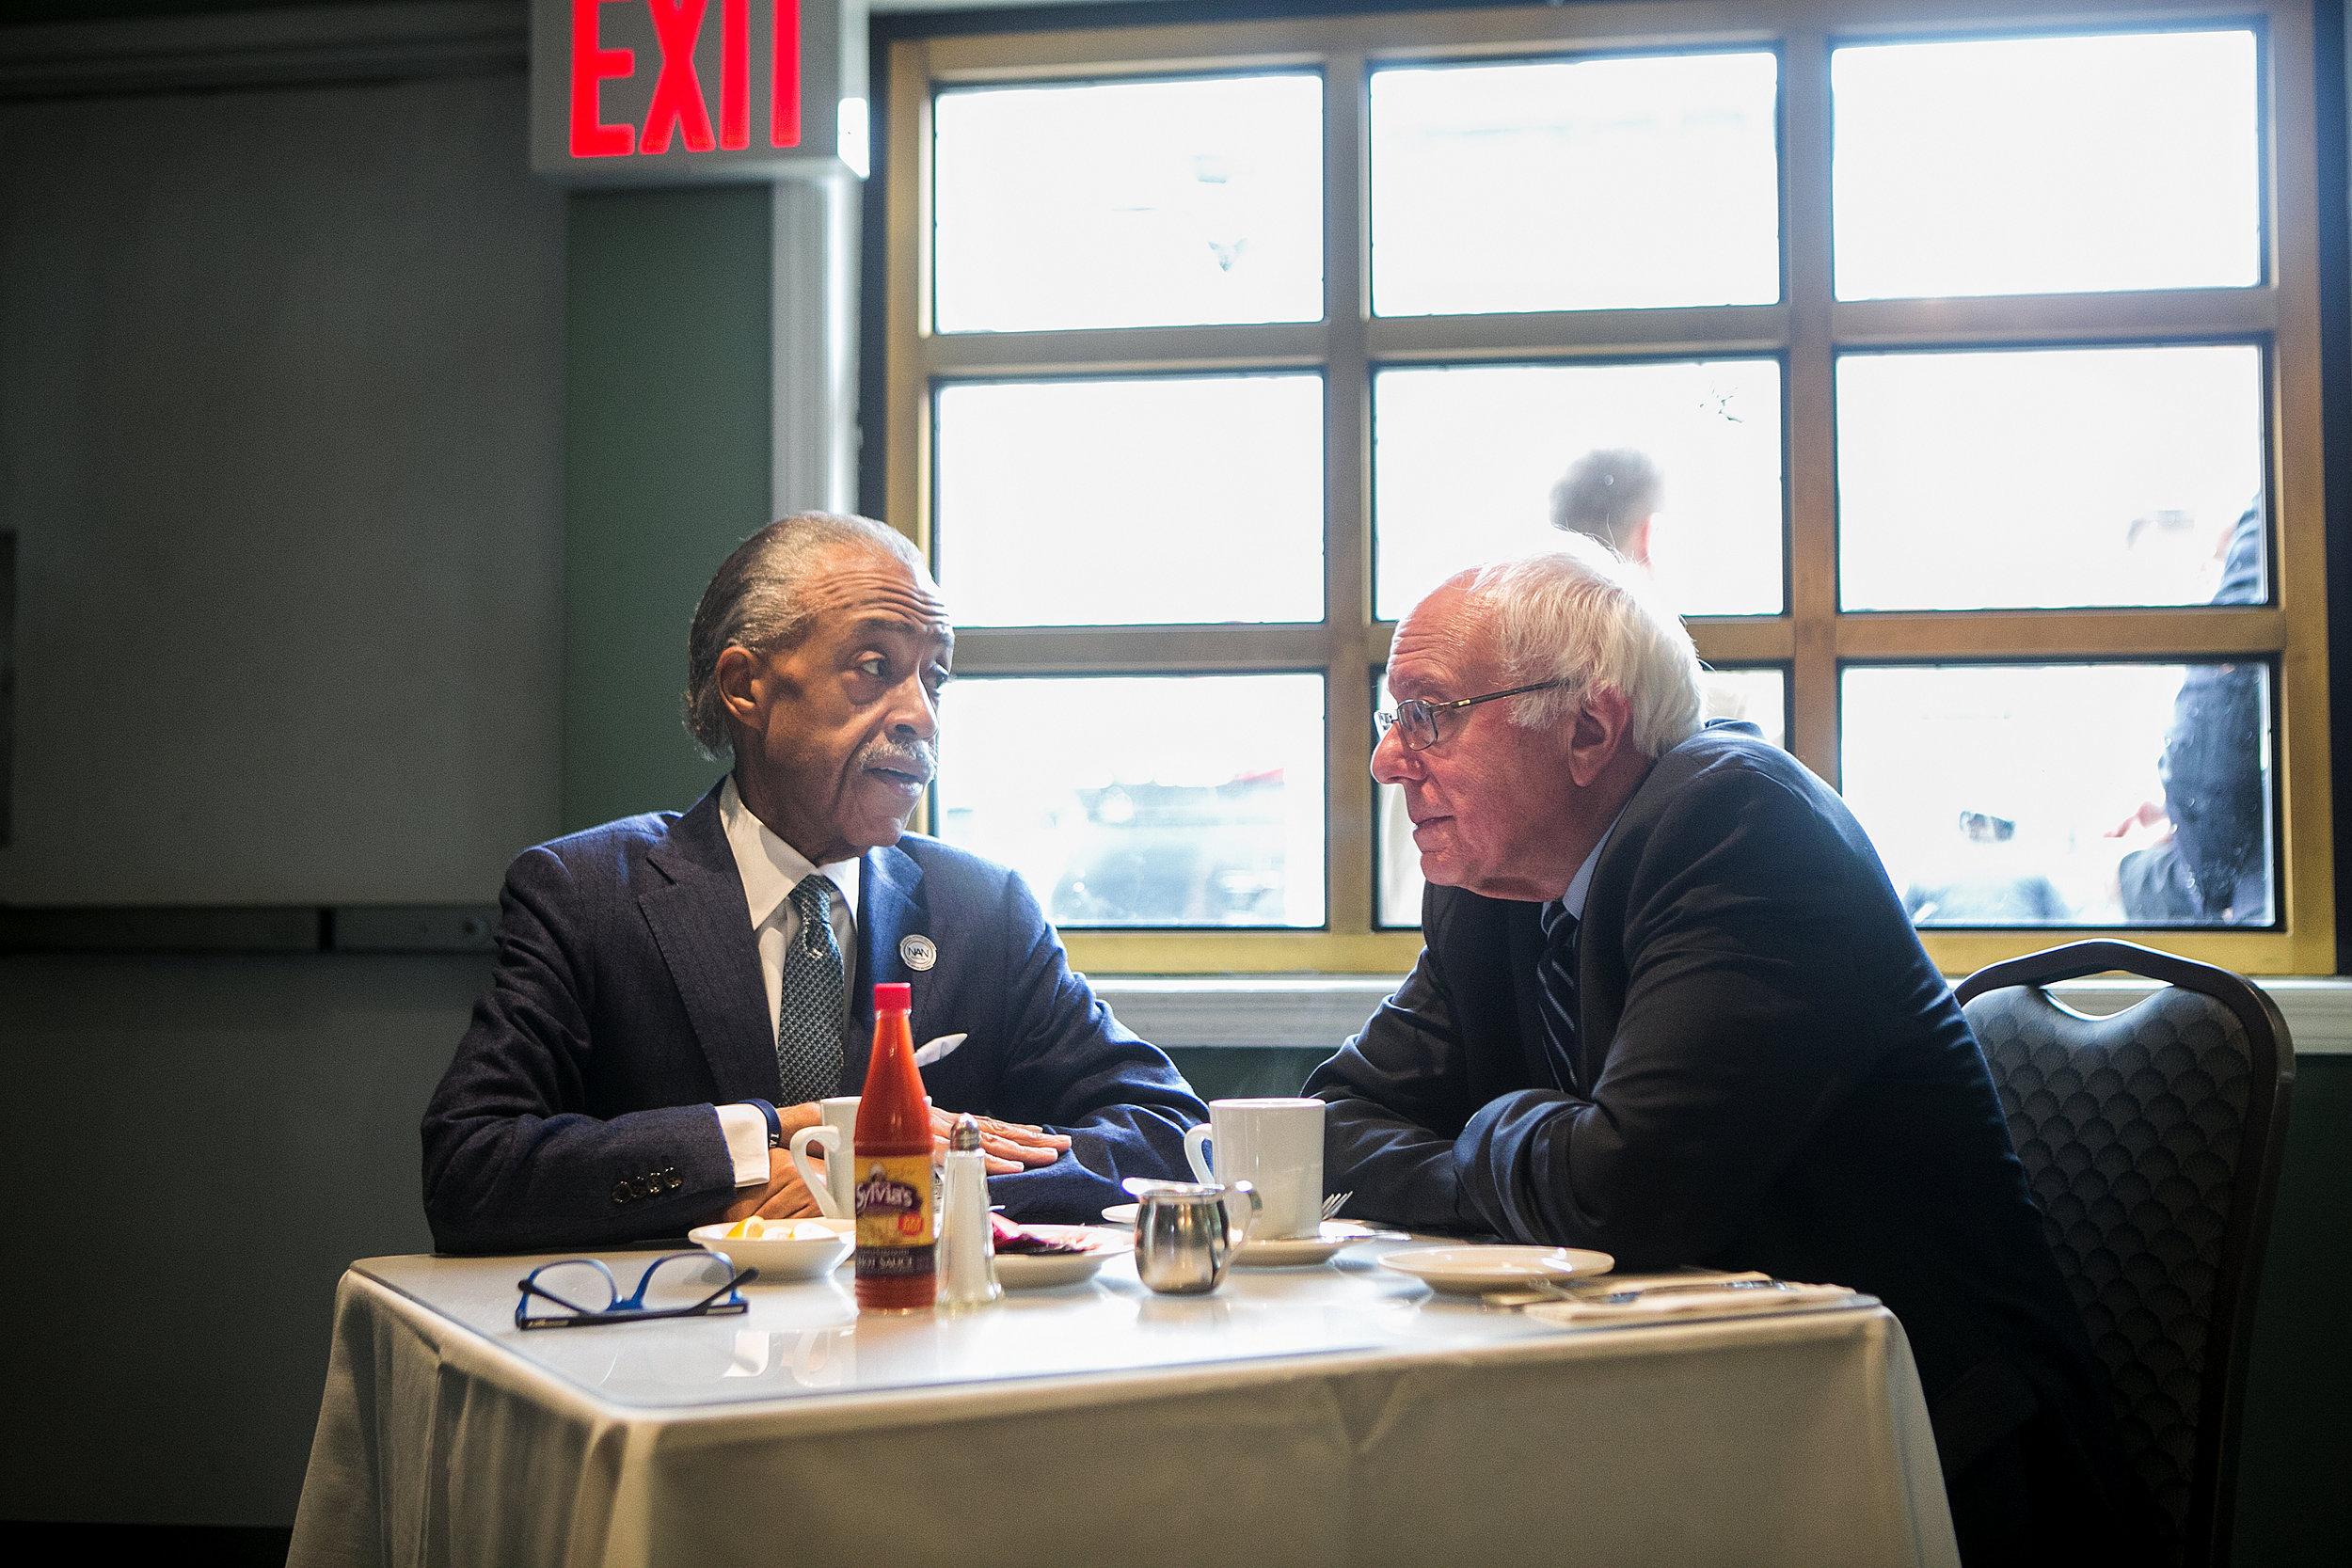 Reverend Al Sharpton meets with Senator Bernie Sanders, a Democratic presidential candidate, at Sylvia's Restaurant in Harlem